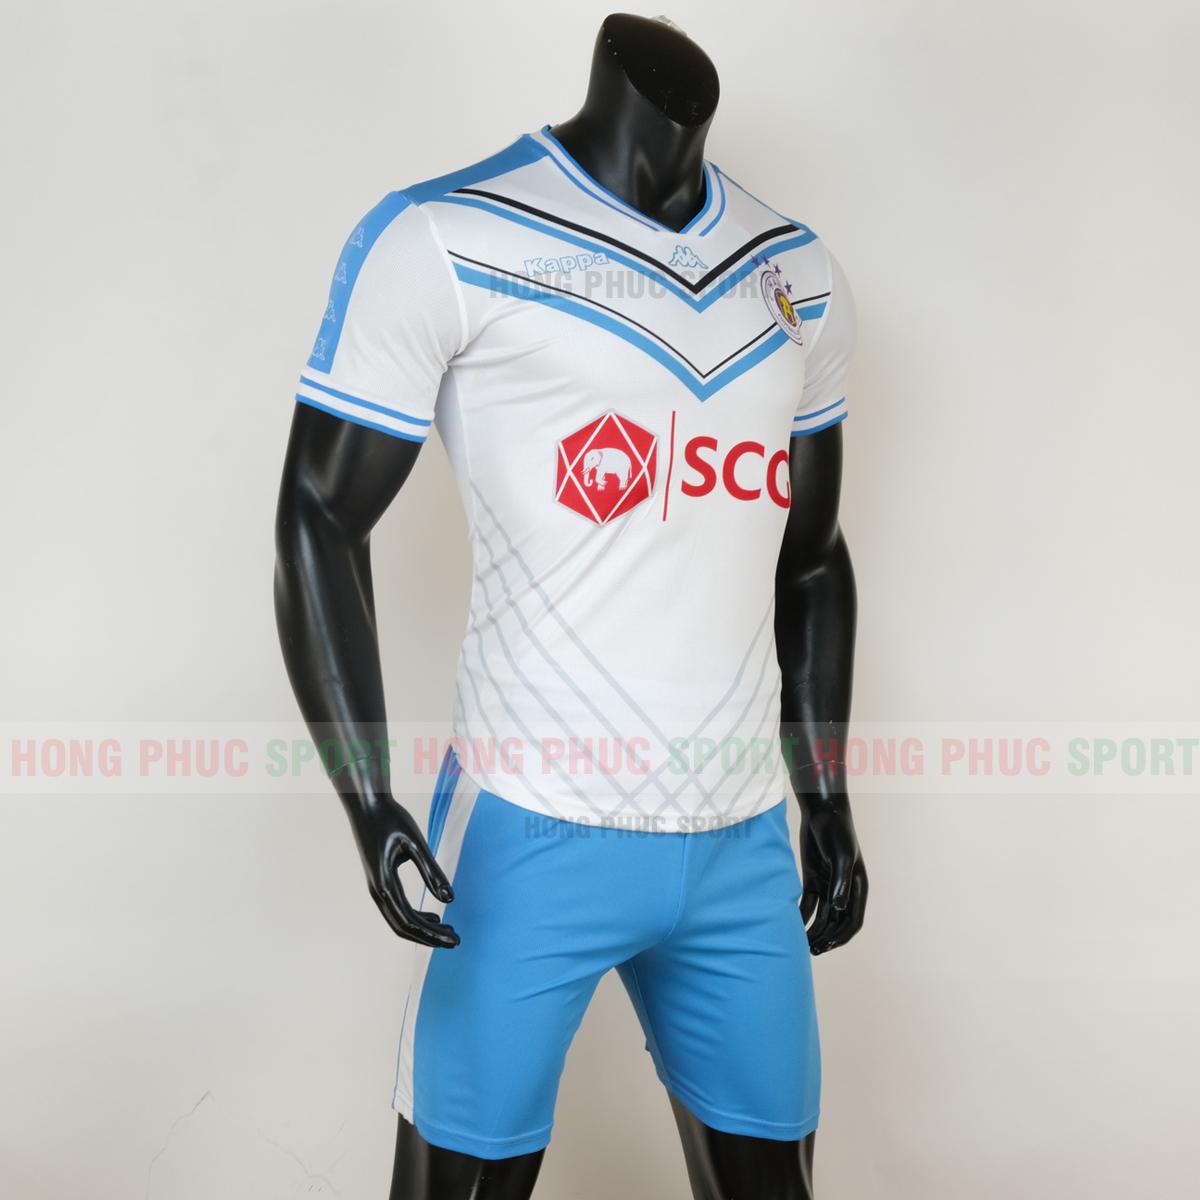 https://cdn.hongphucsport.com/unsafe/cdn.hongphucsport.com/dothethao.net.vn/wp-content/uploads/2019/12/ao-bong-da-ha-noi-san-khach-2020-2021-mau-trang-soc-xanh-4.png